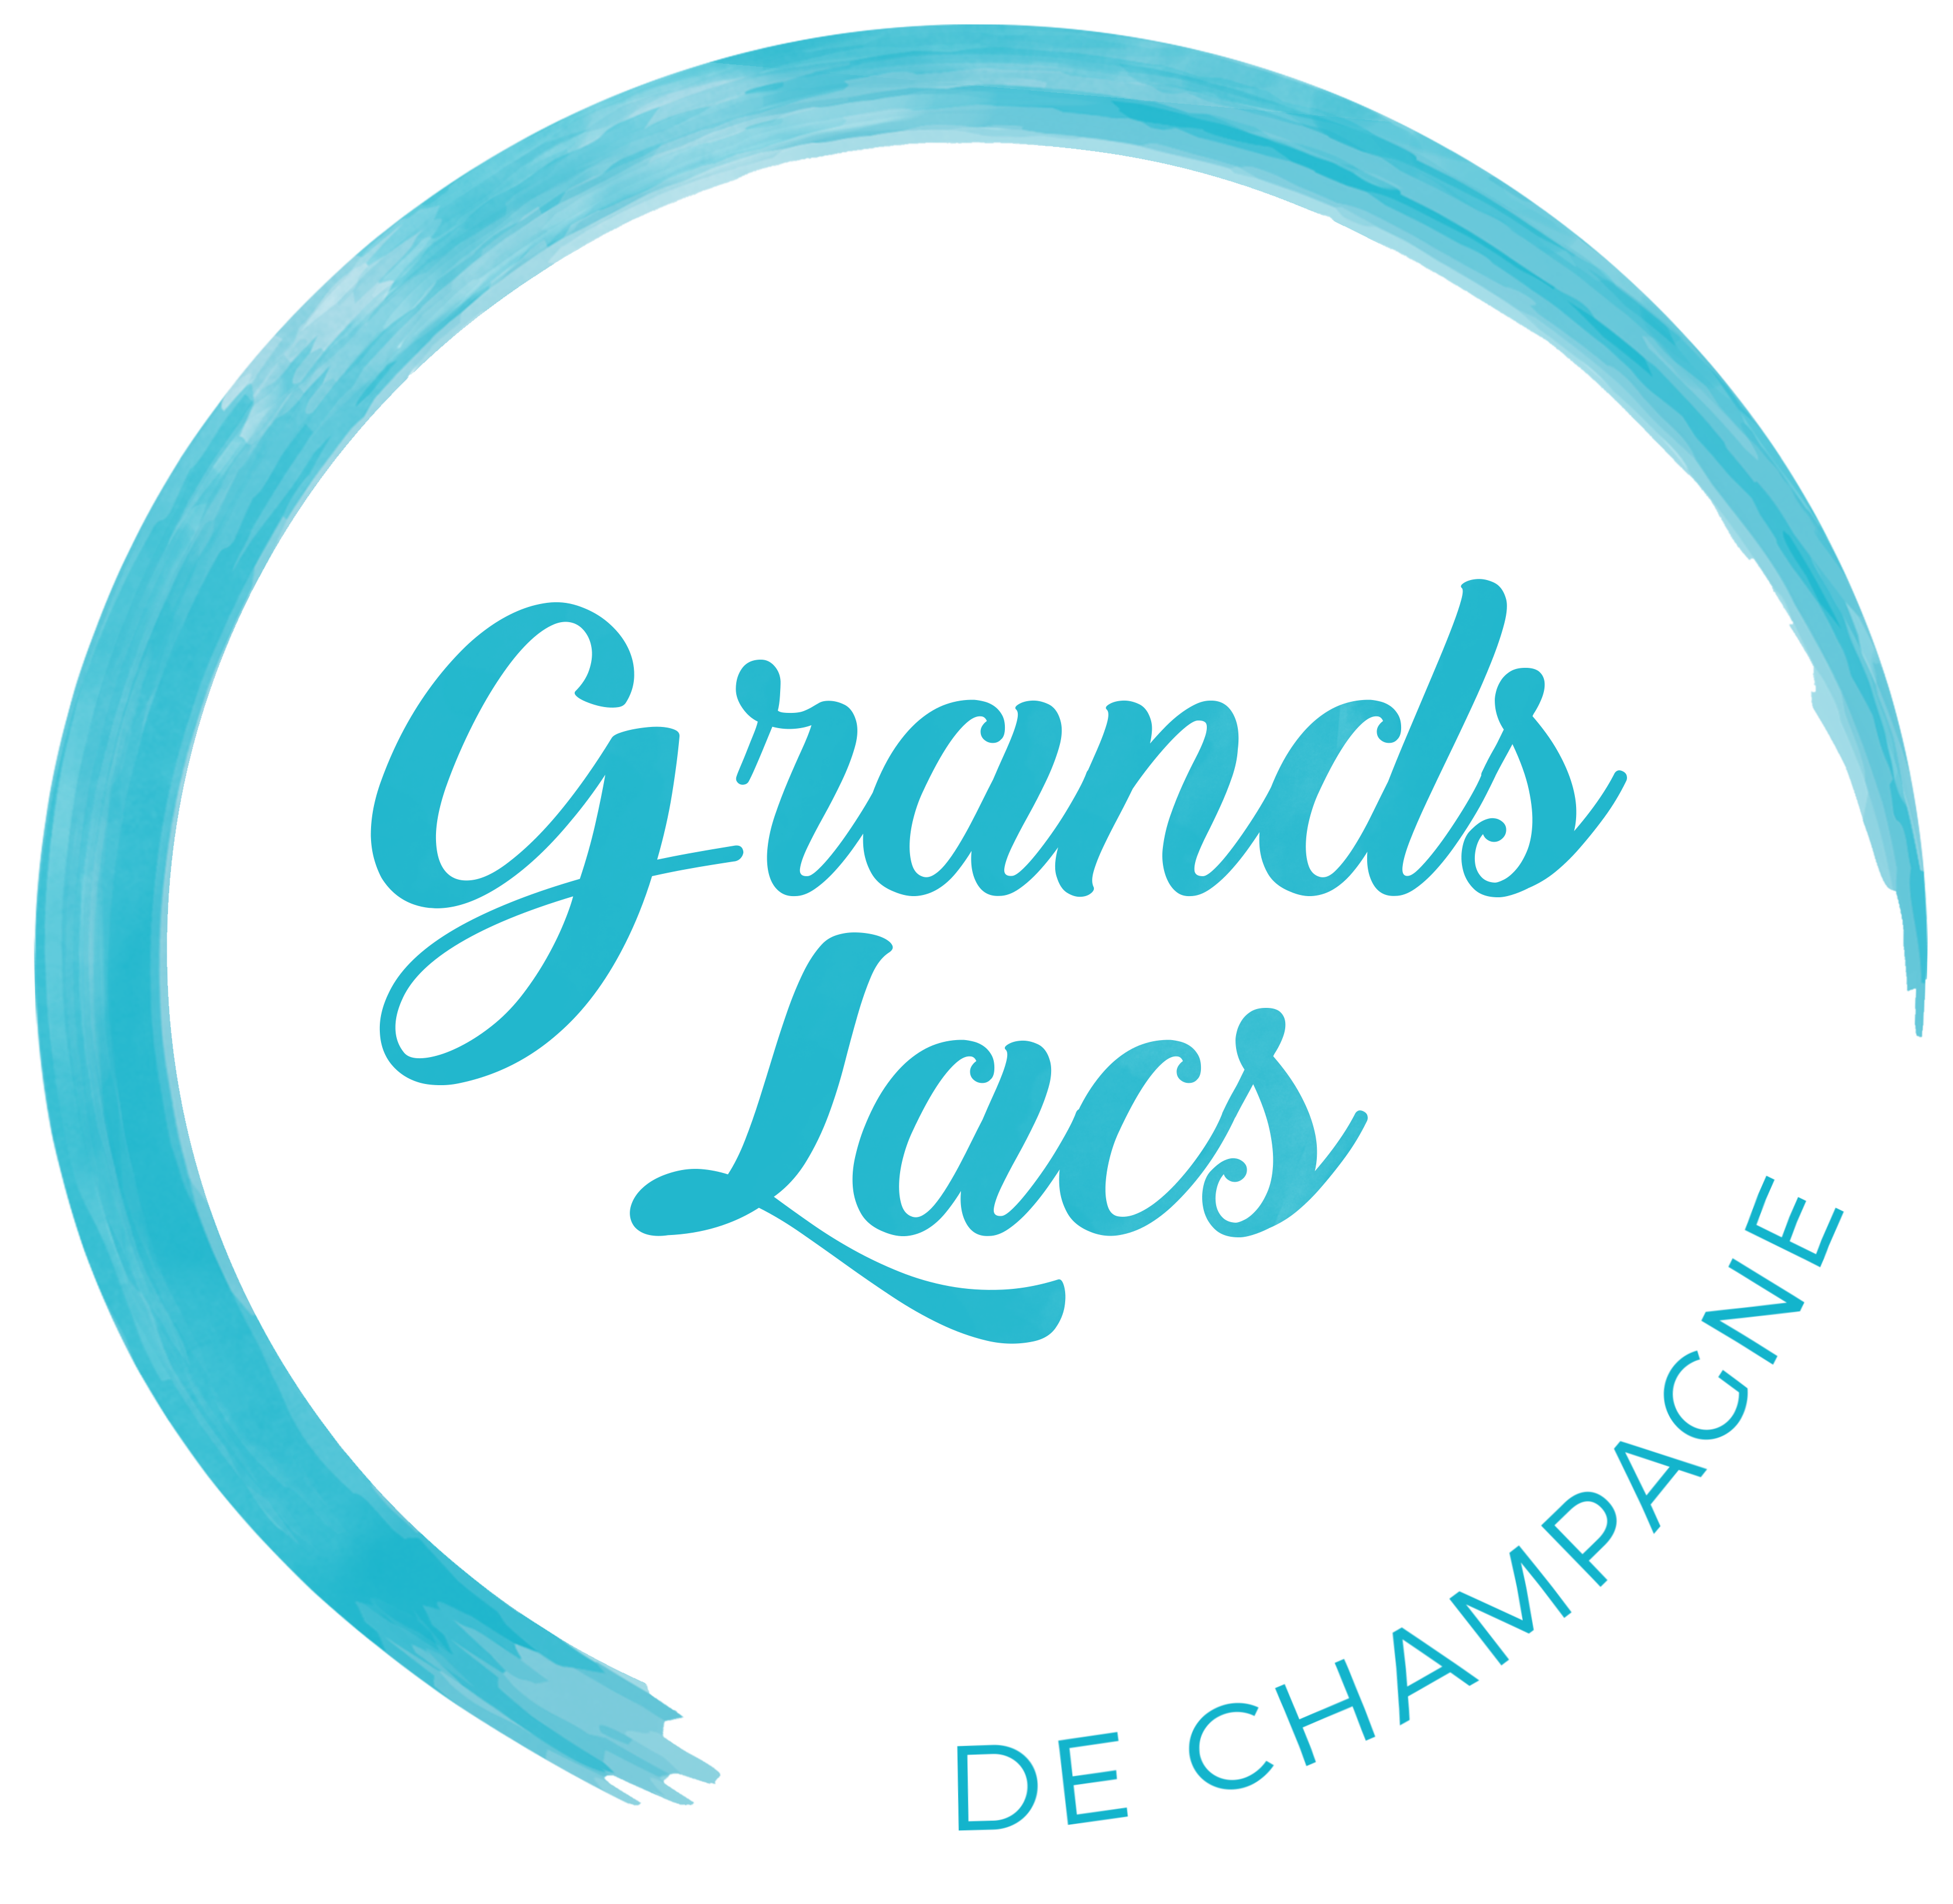 cc_champagne